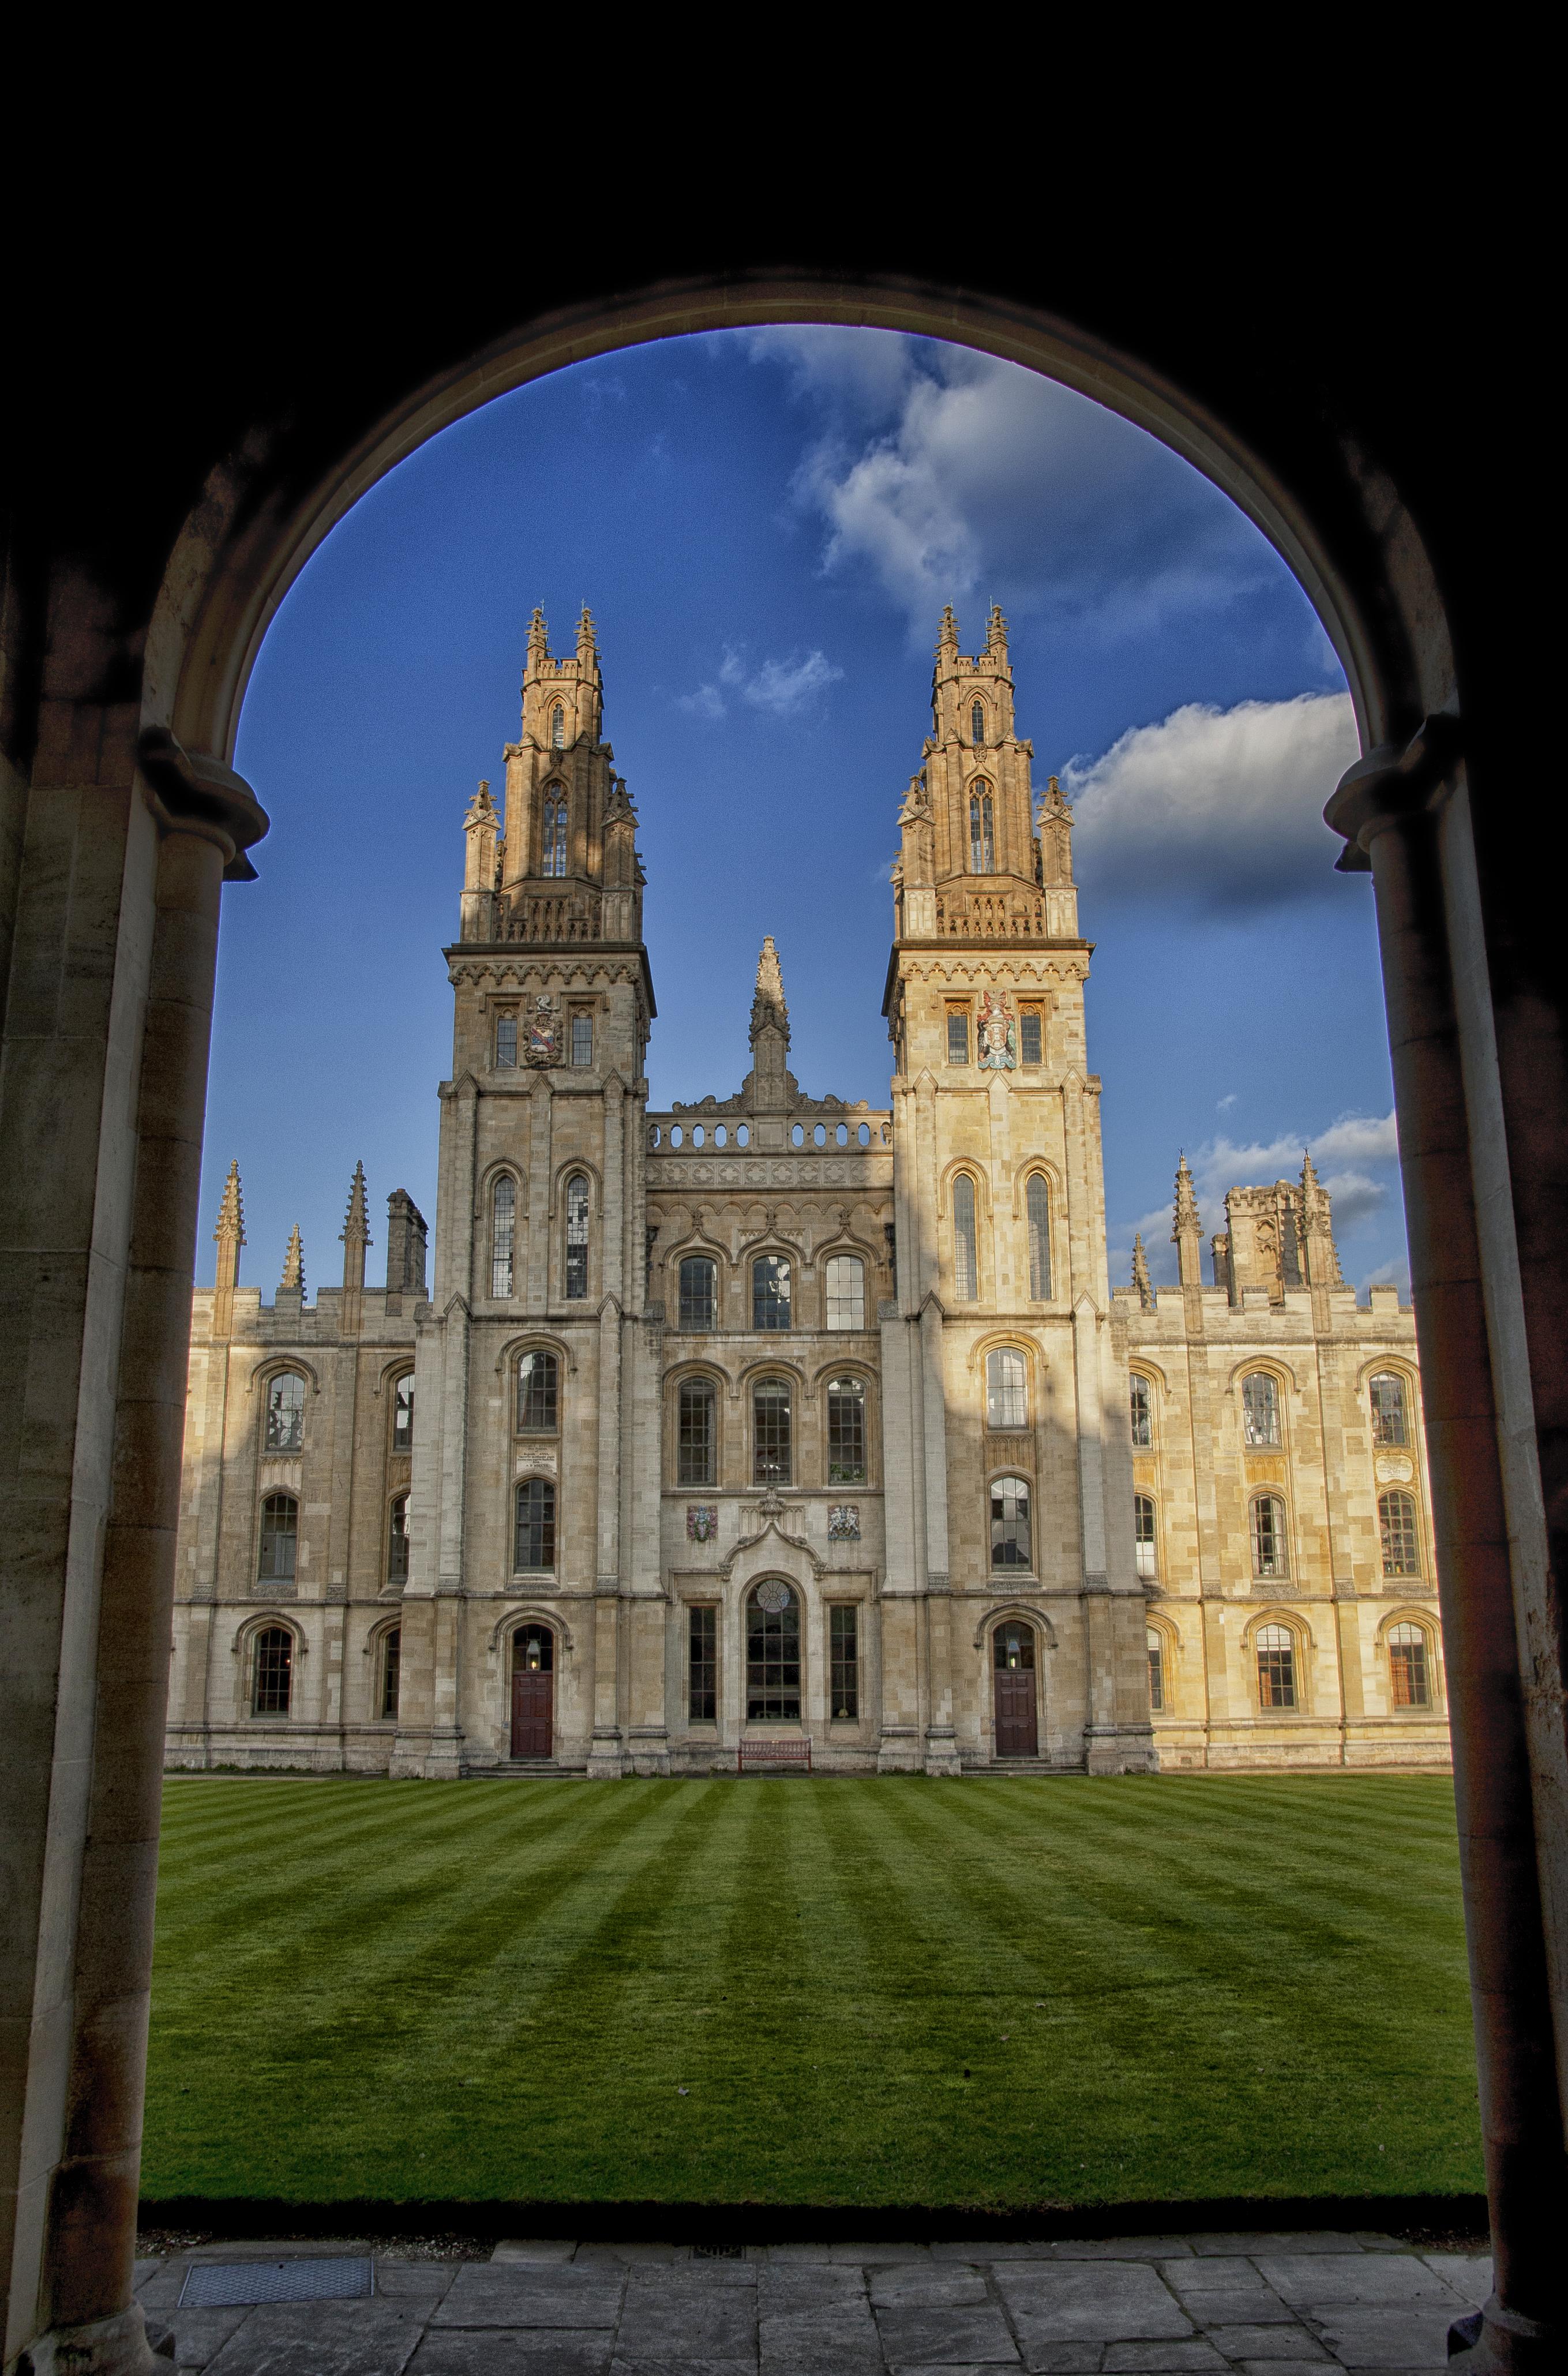 University Of Oxford: College University: All Souls College University Of Oxford